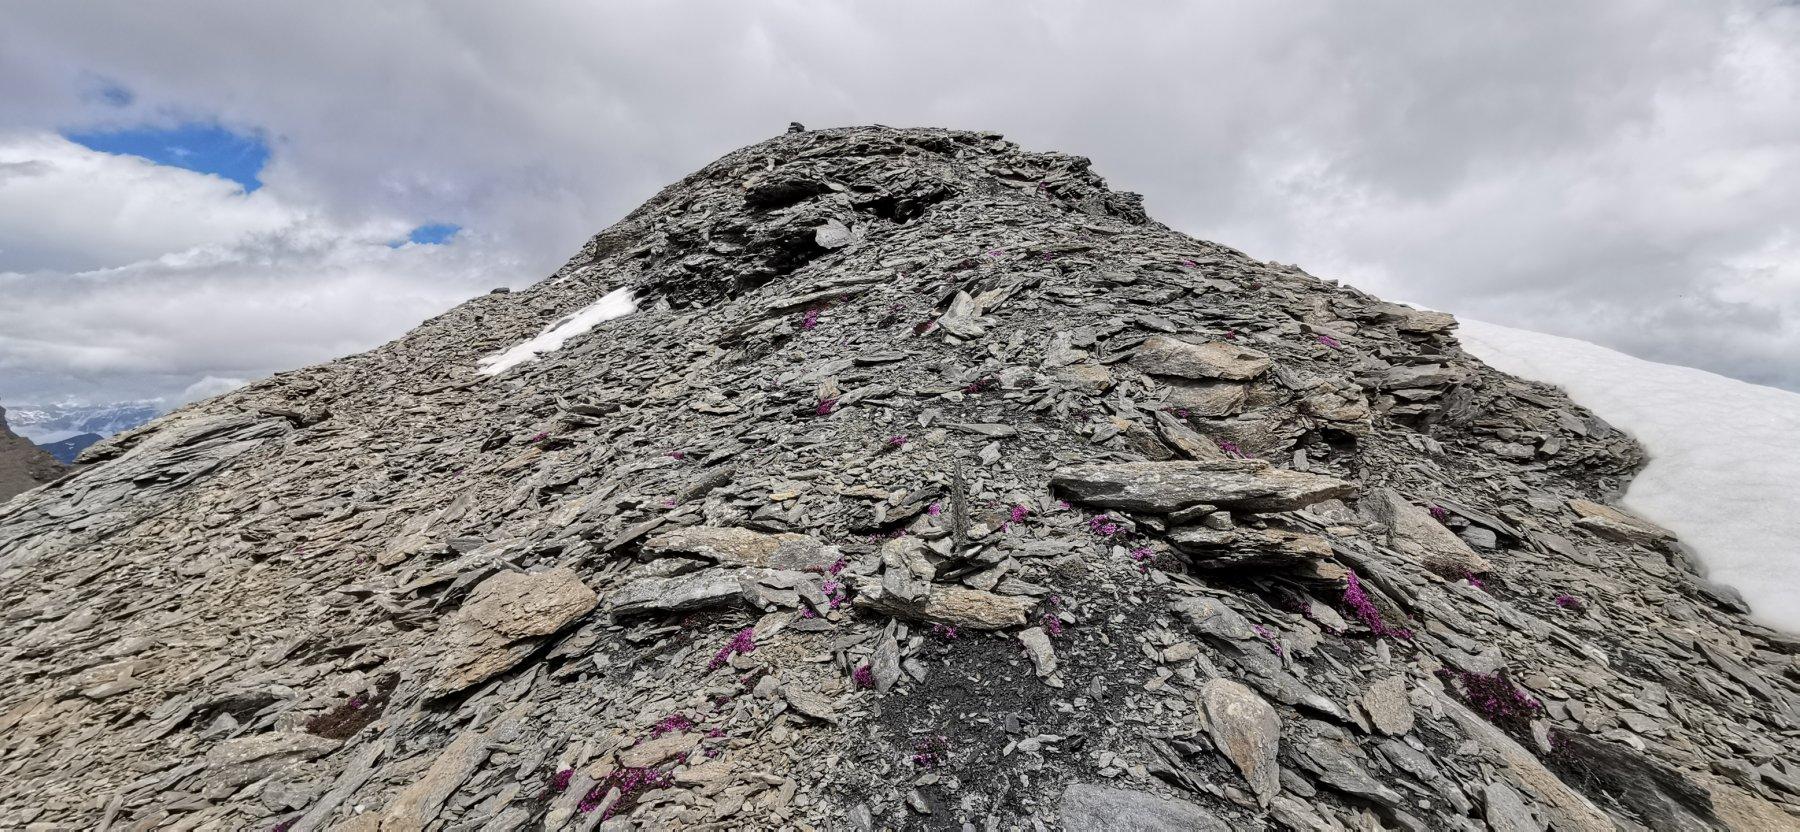 ultimi metri di pietrame prima di arrivare in cima